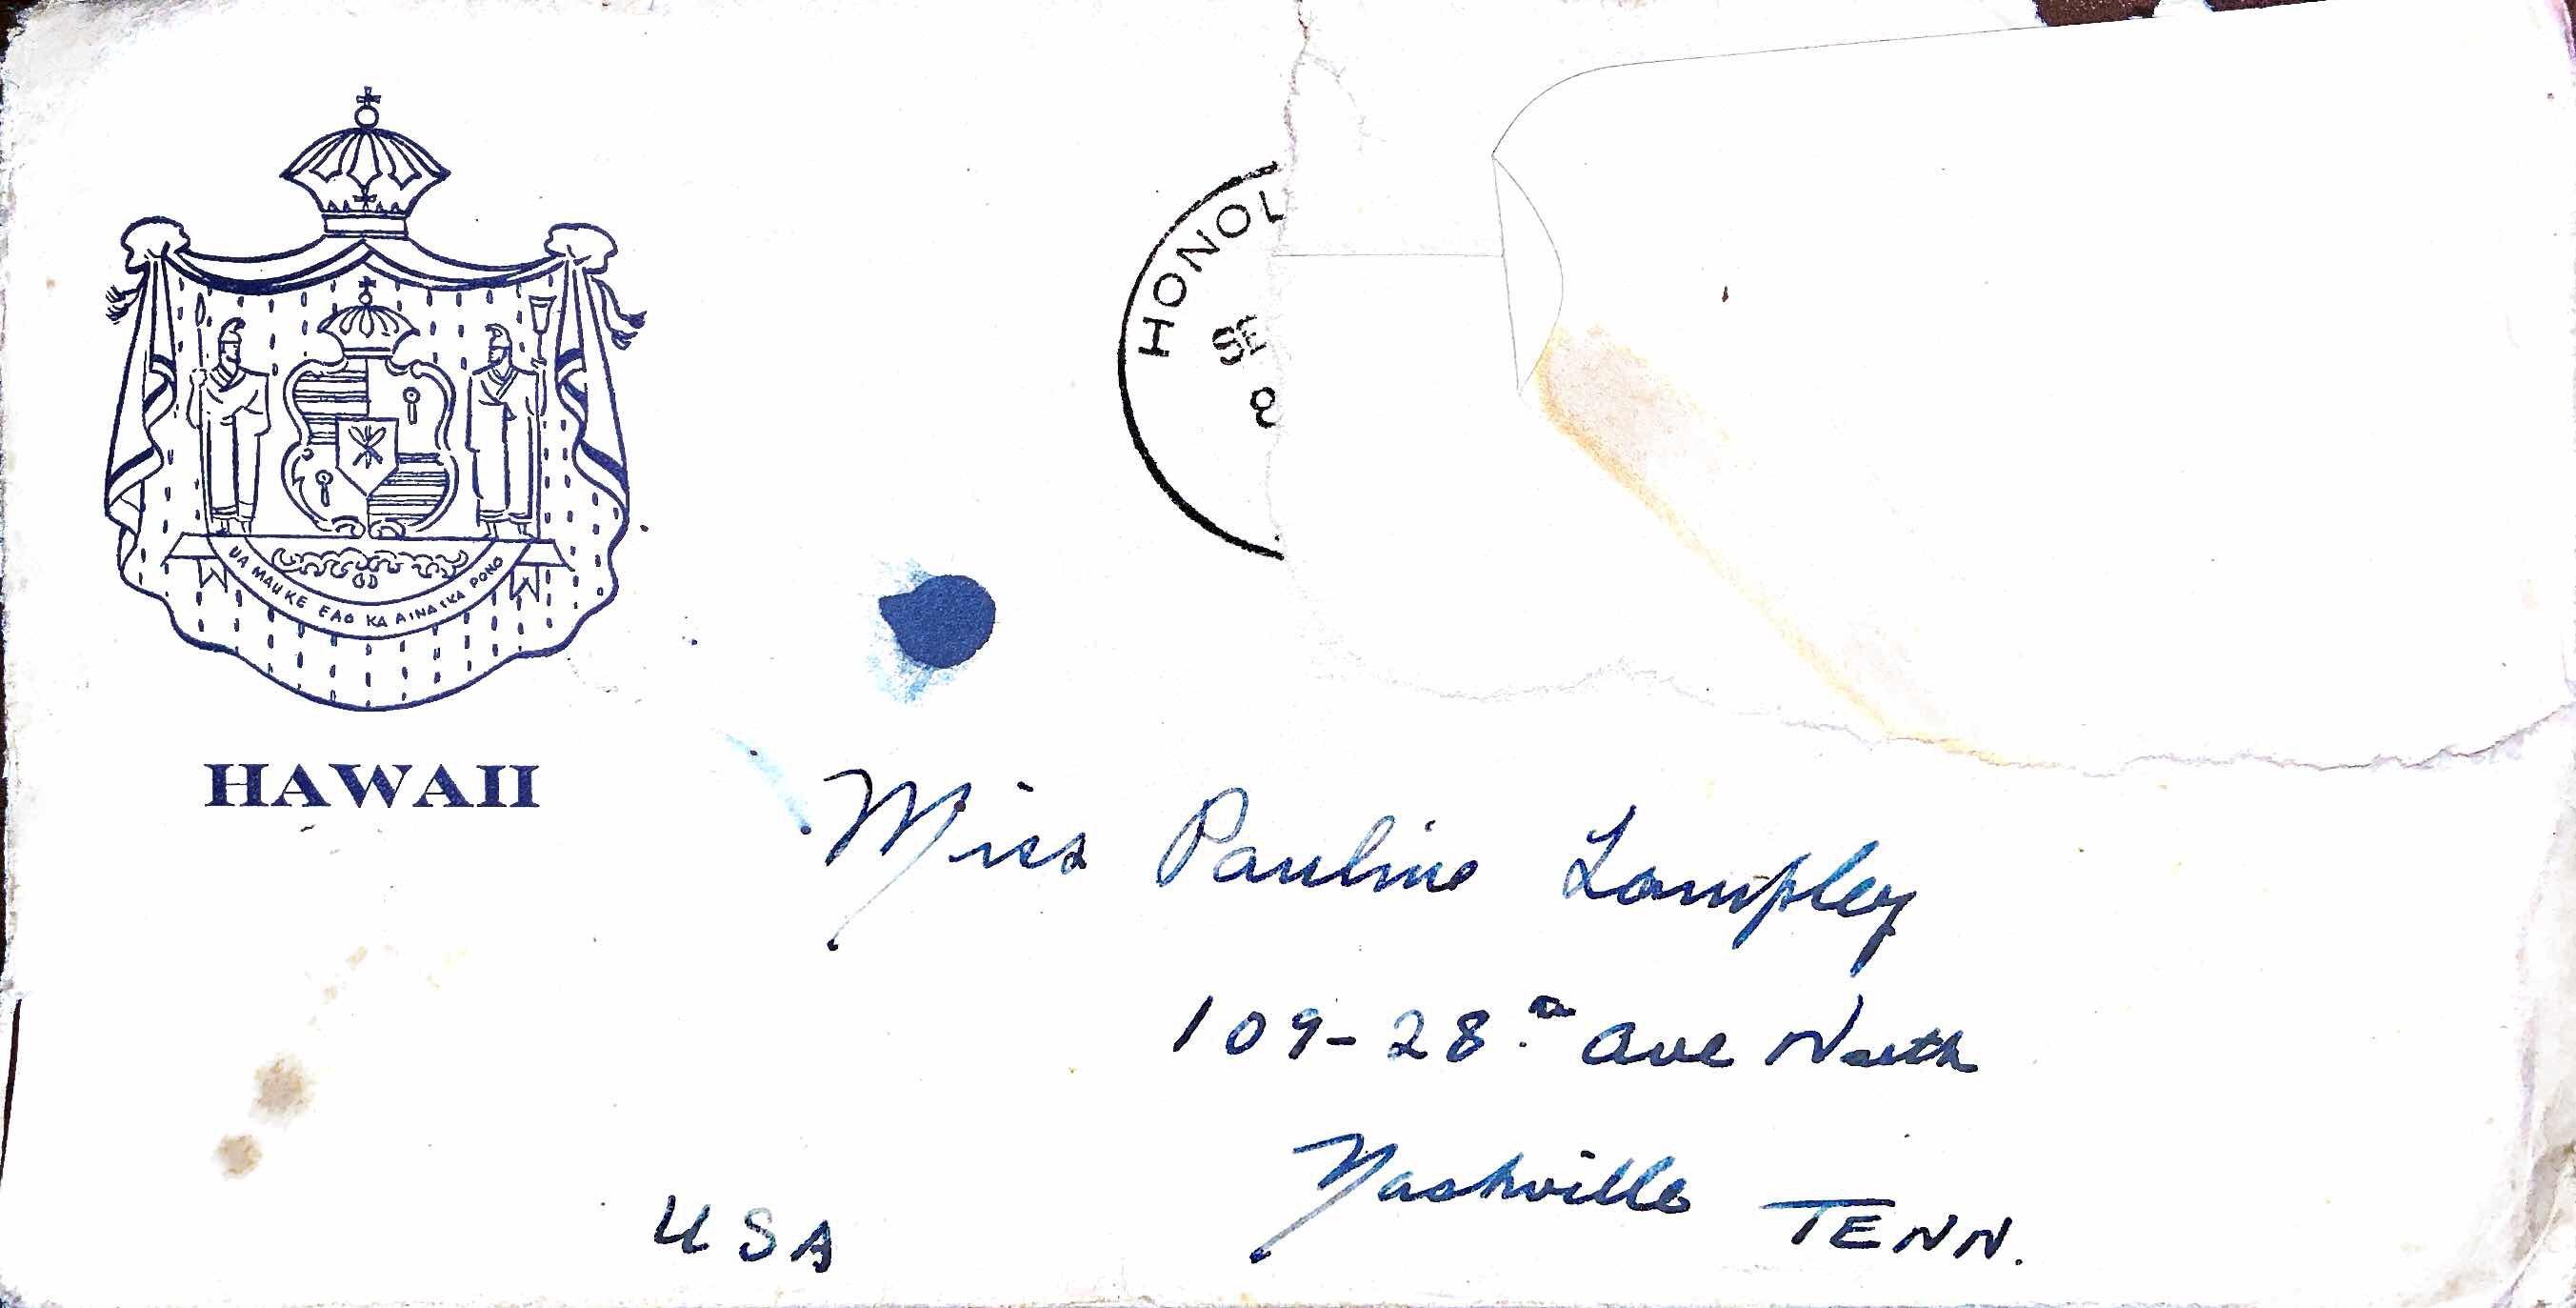 September 10, 1941 Dear Pauline